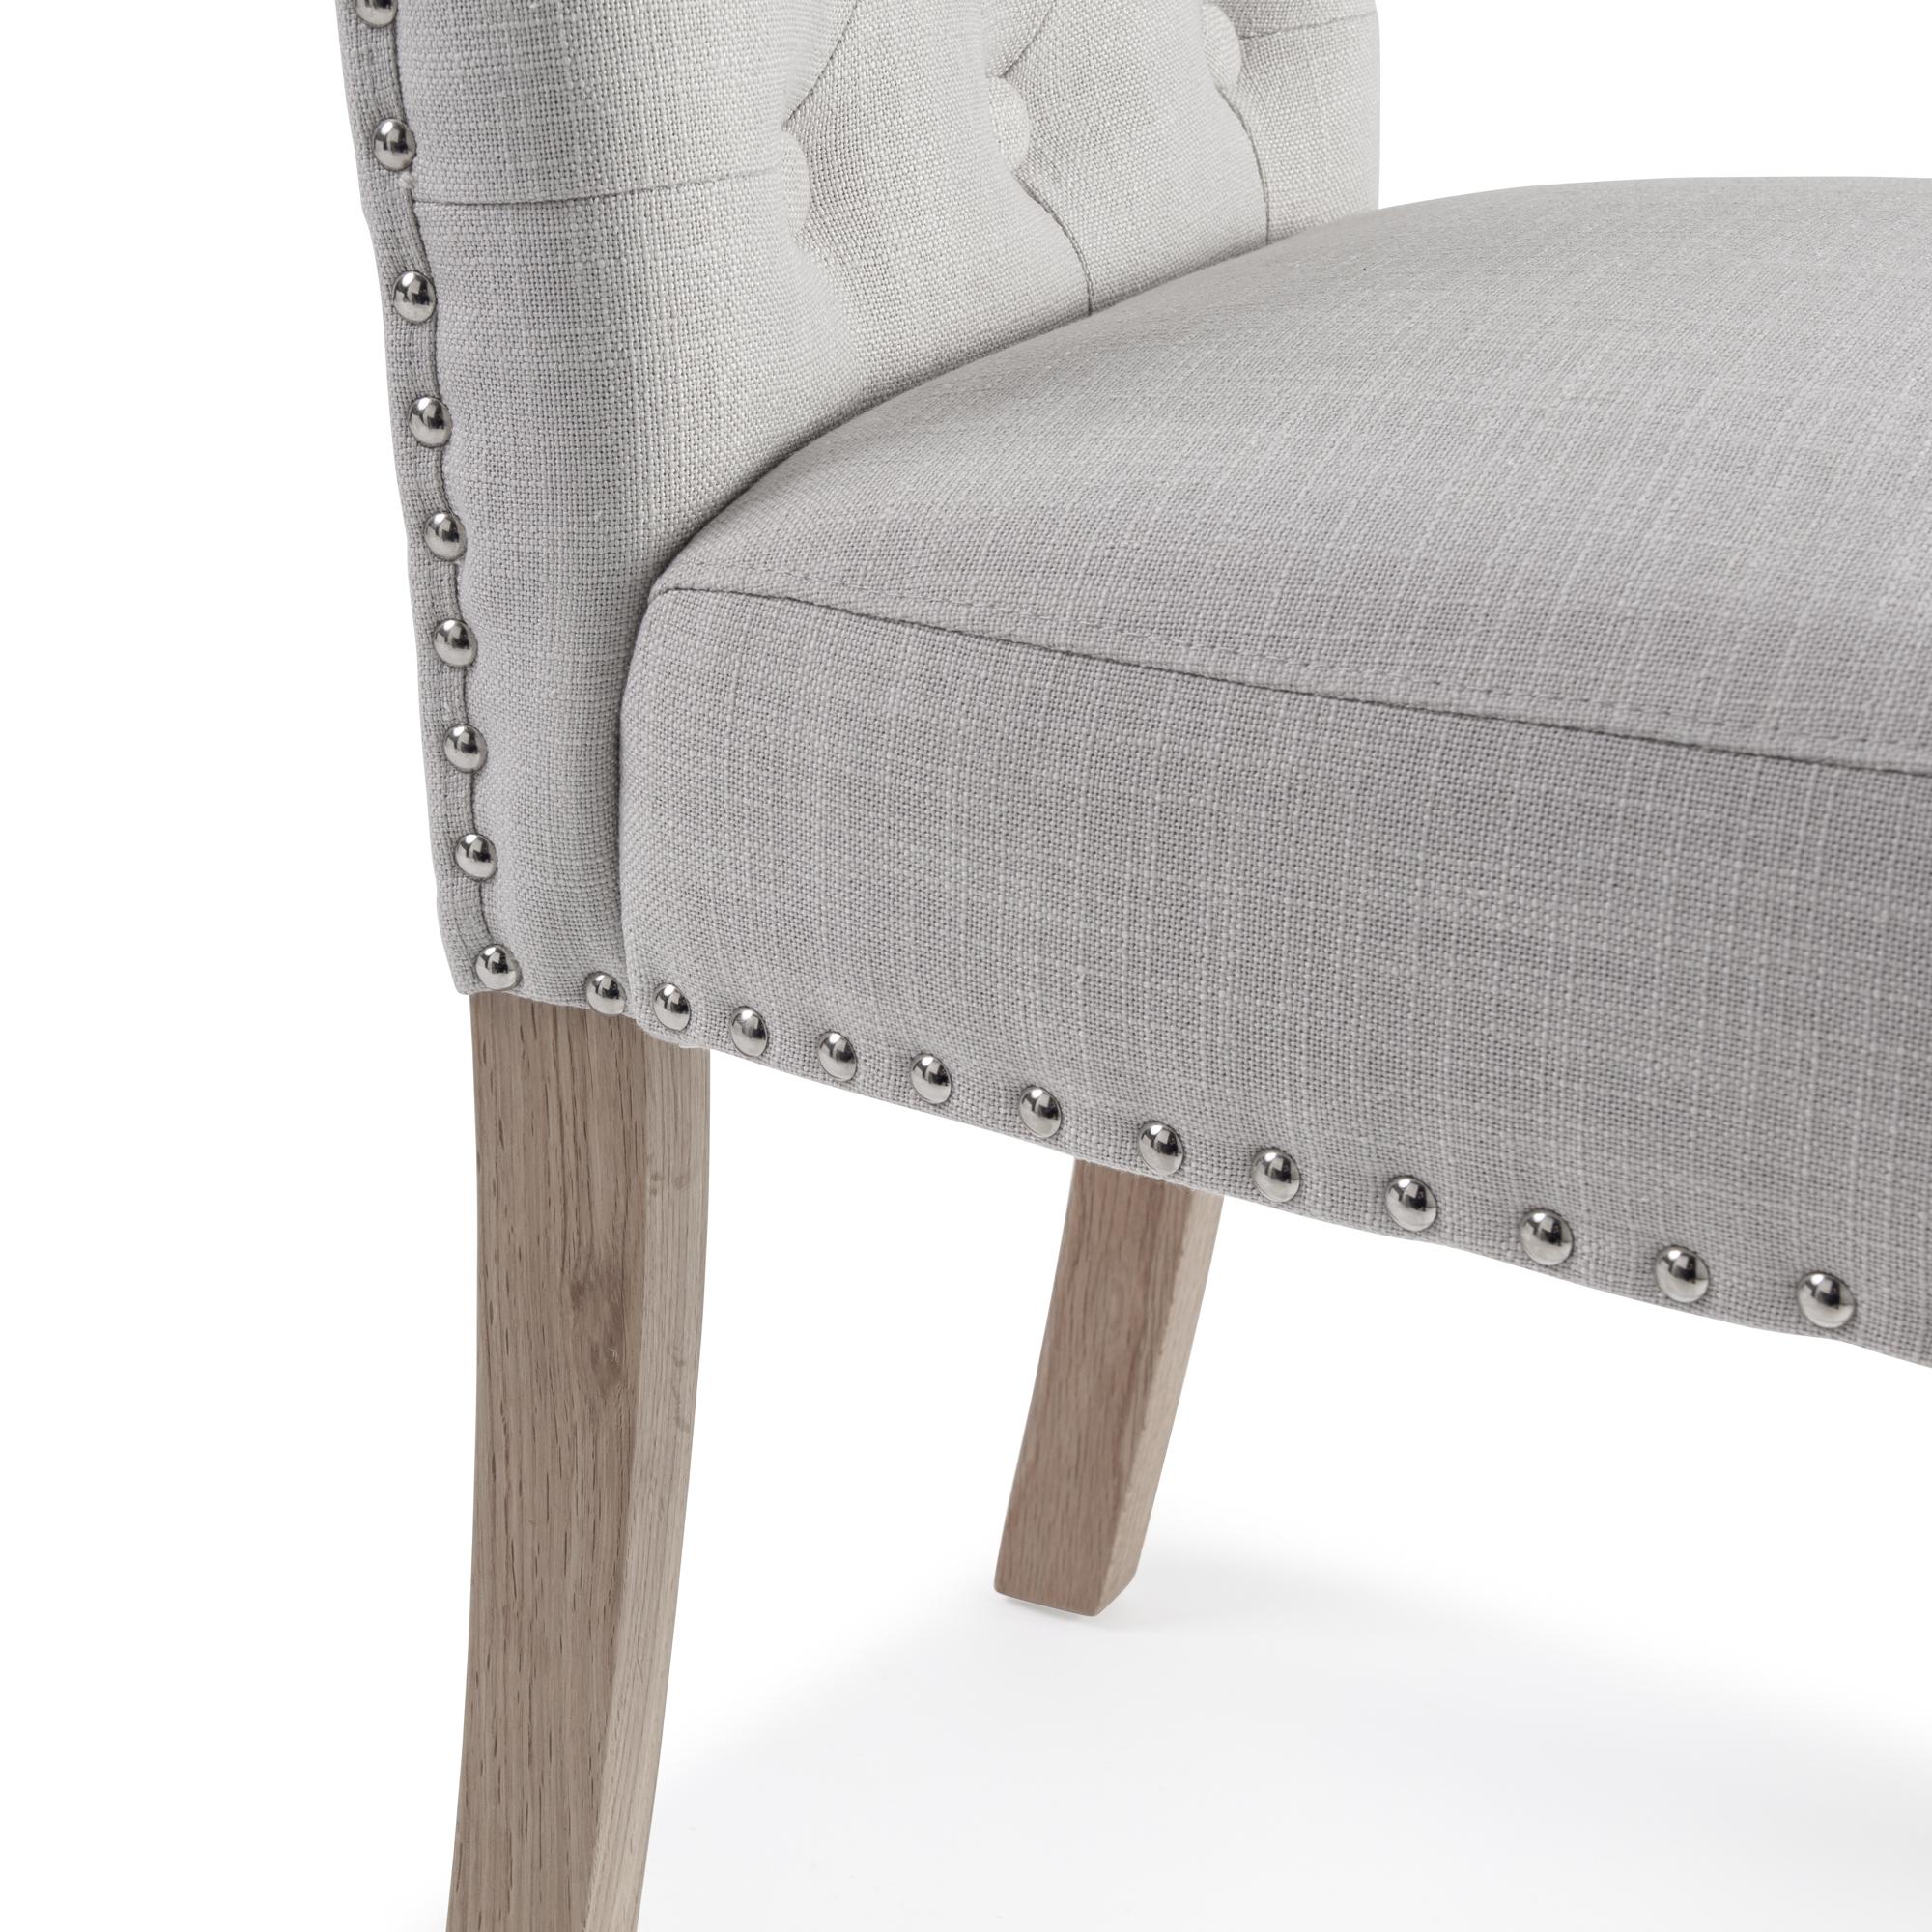 Harrogate Cream Natural Linen Dining Chairs (Set of 2)